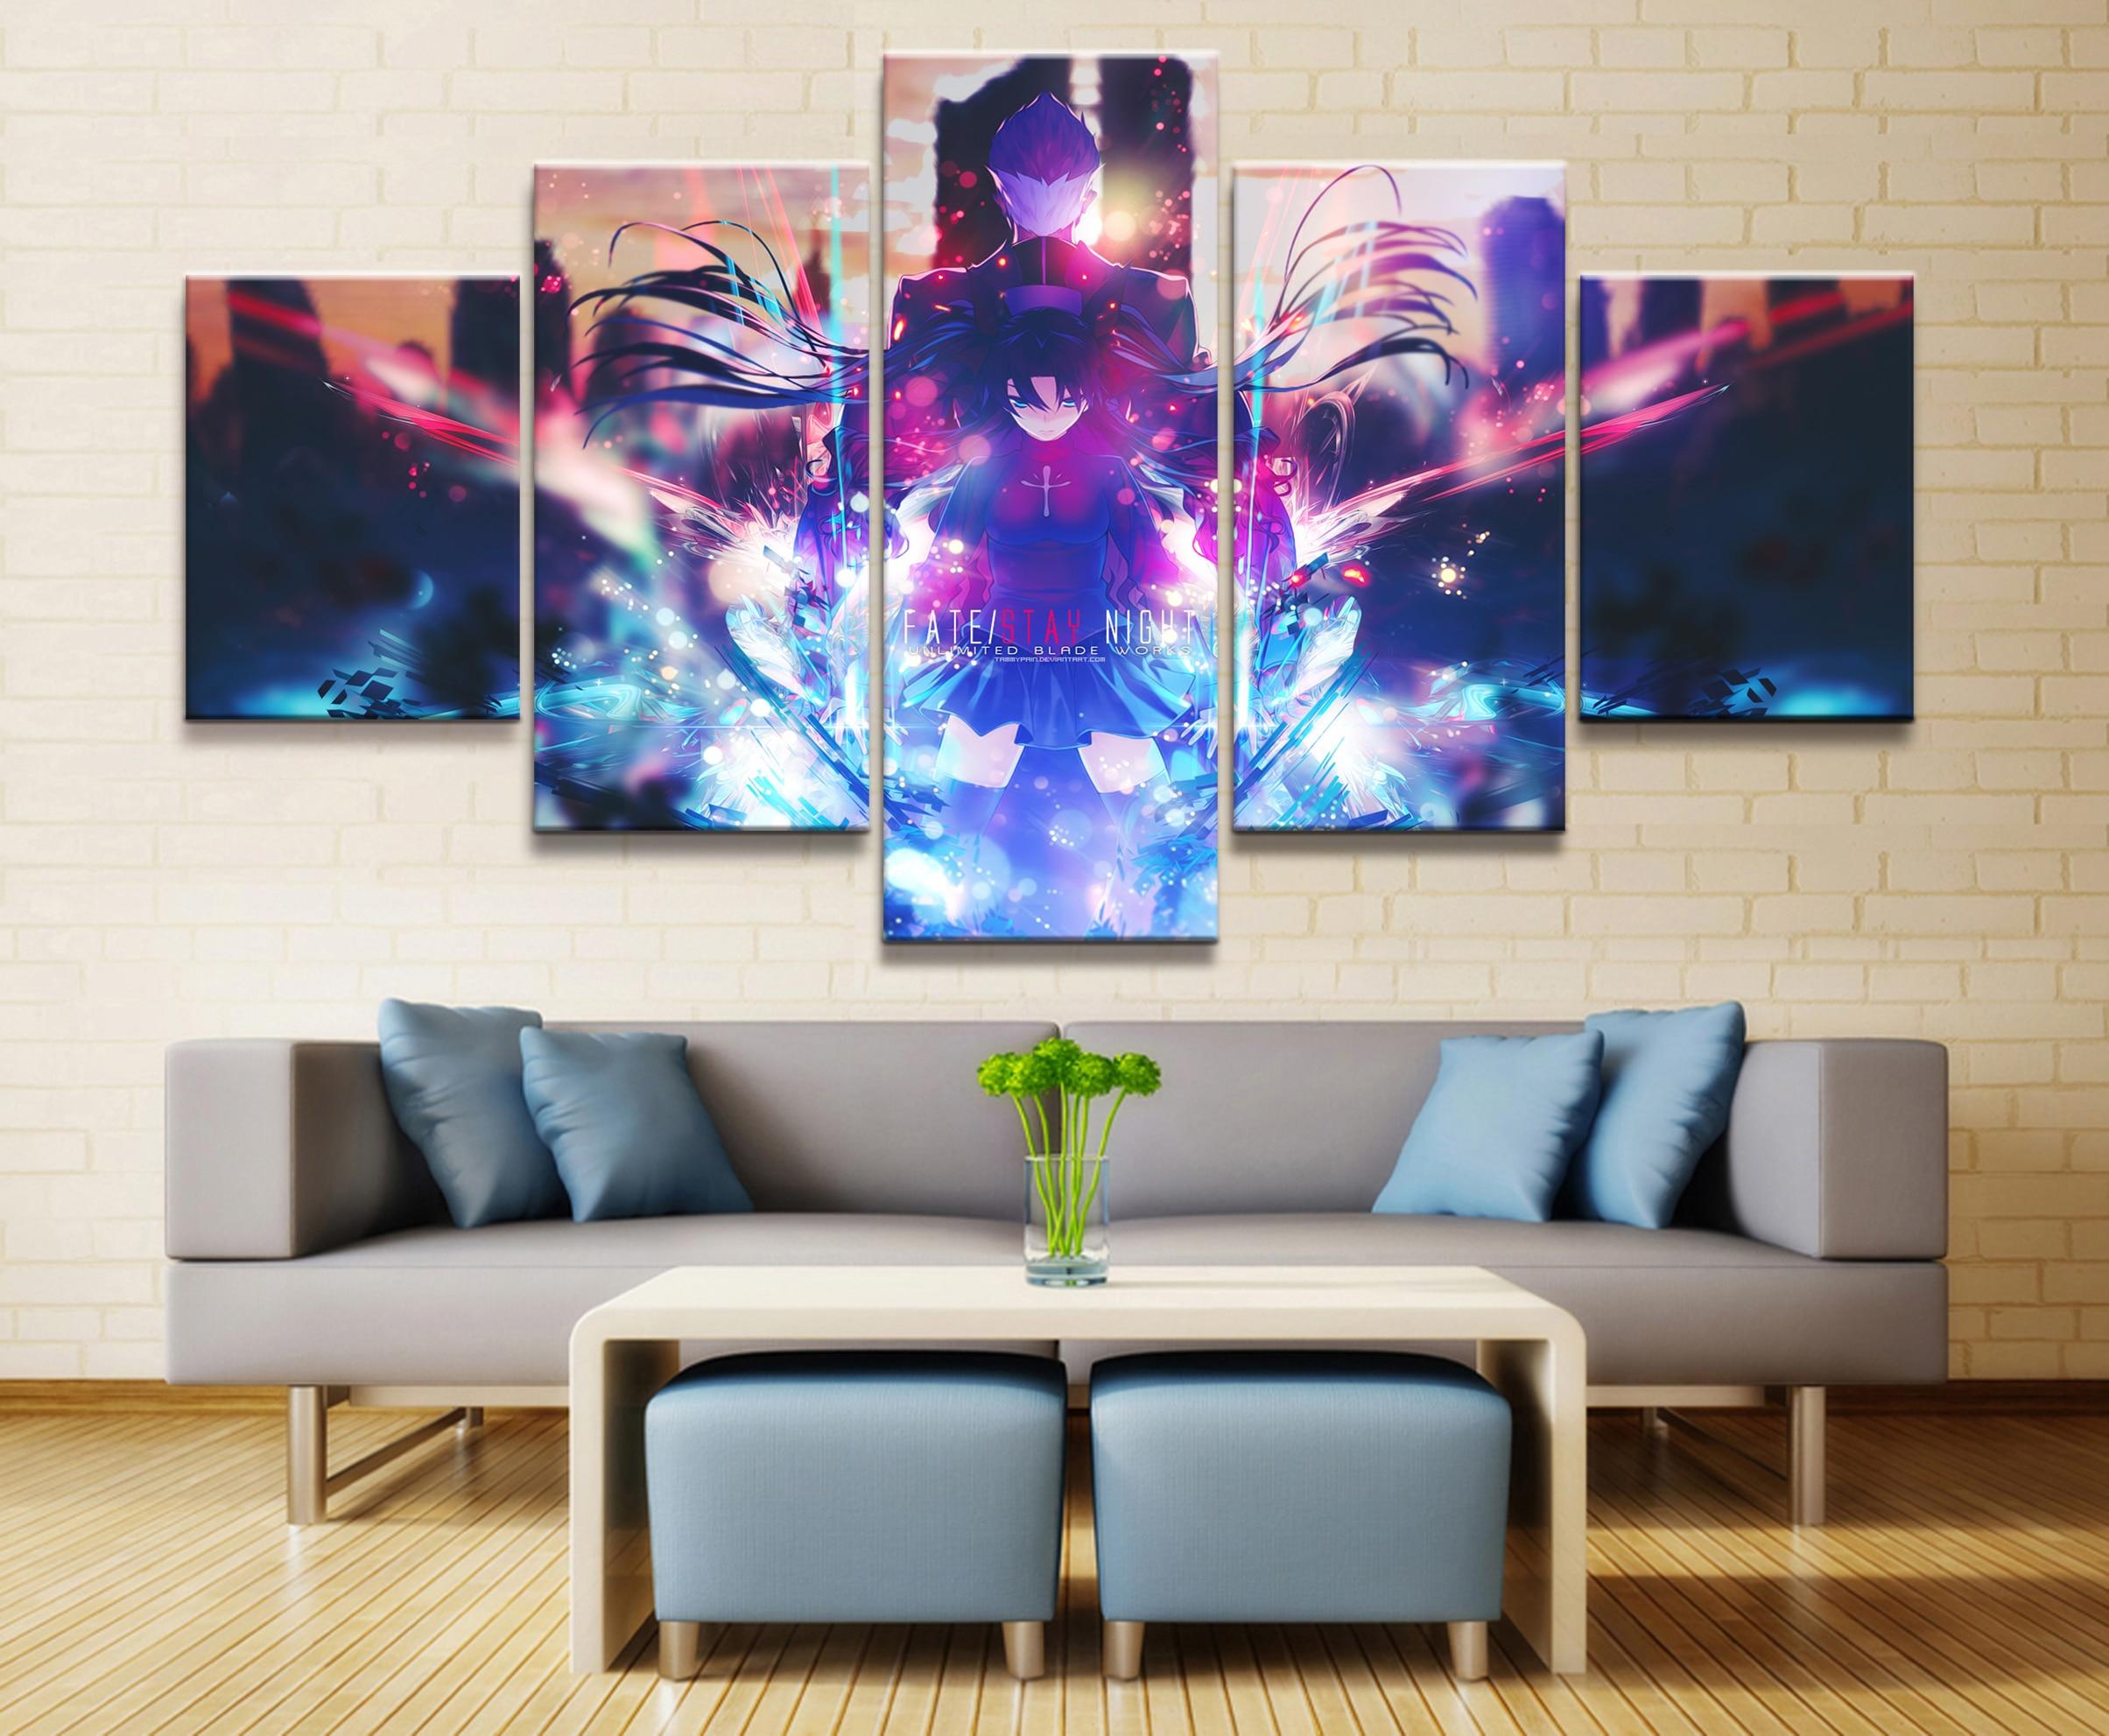 Dragon Ball Saiyan HD Canvas Print Painting Home Decor room Wall art Picture 612